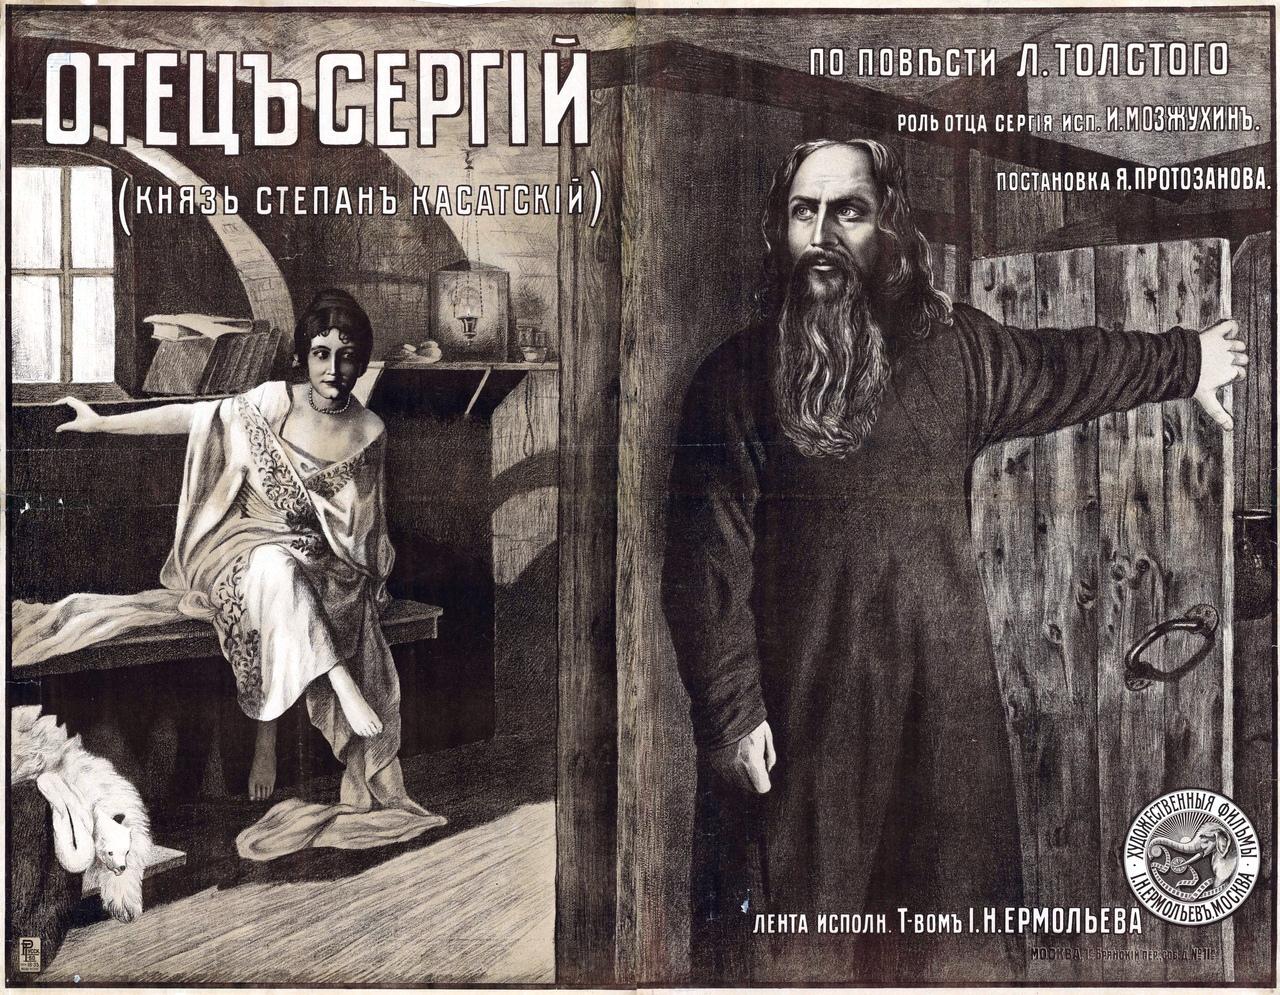 Otets_Sergiy_1918_Poster.jpg